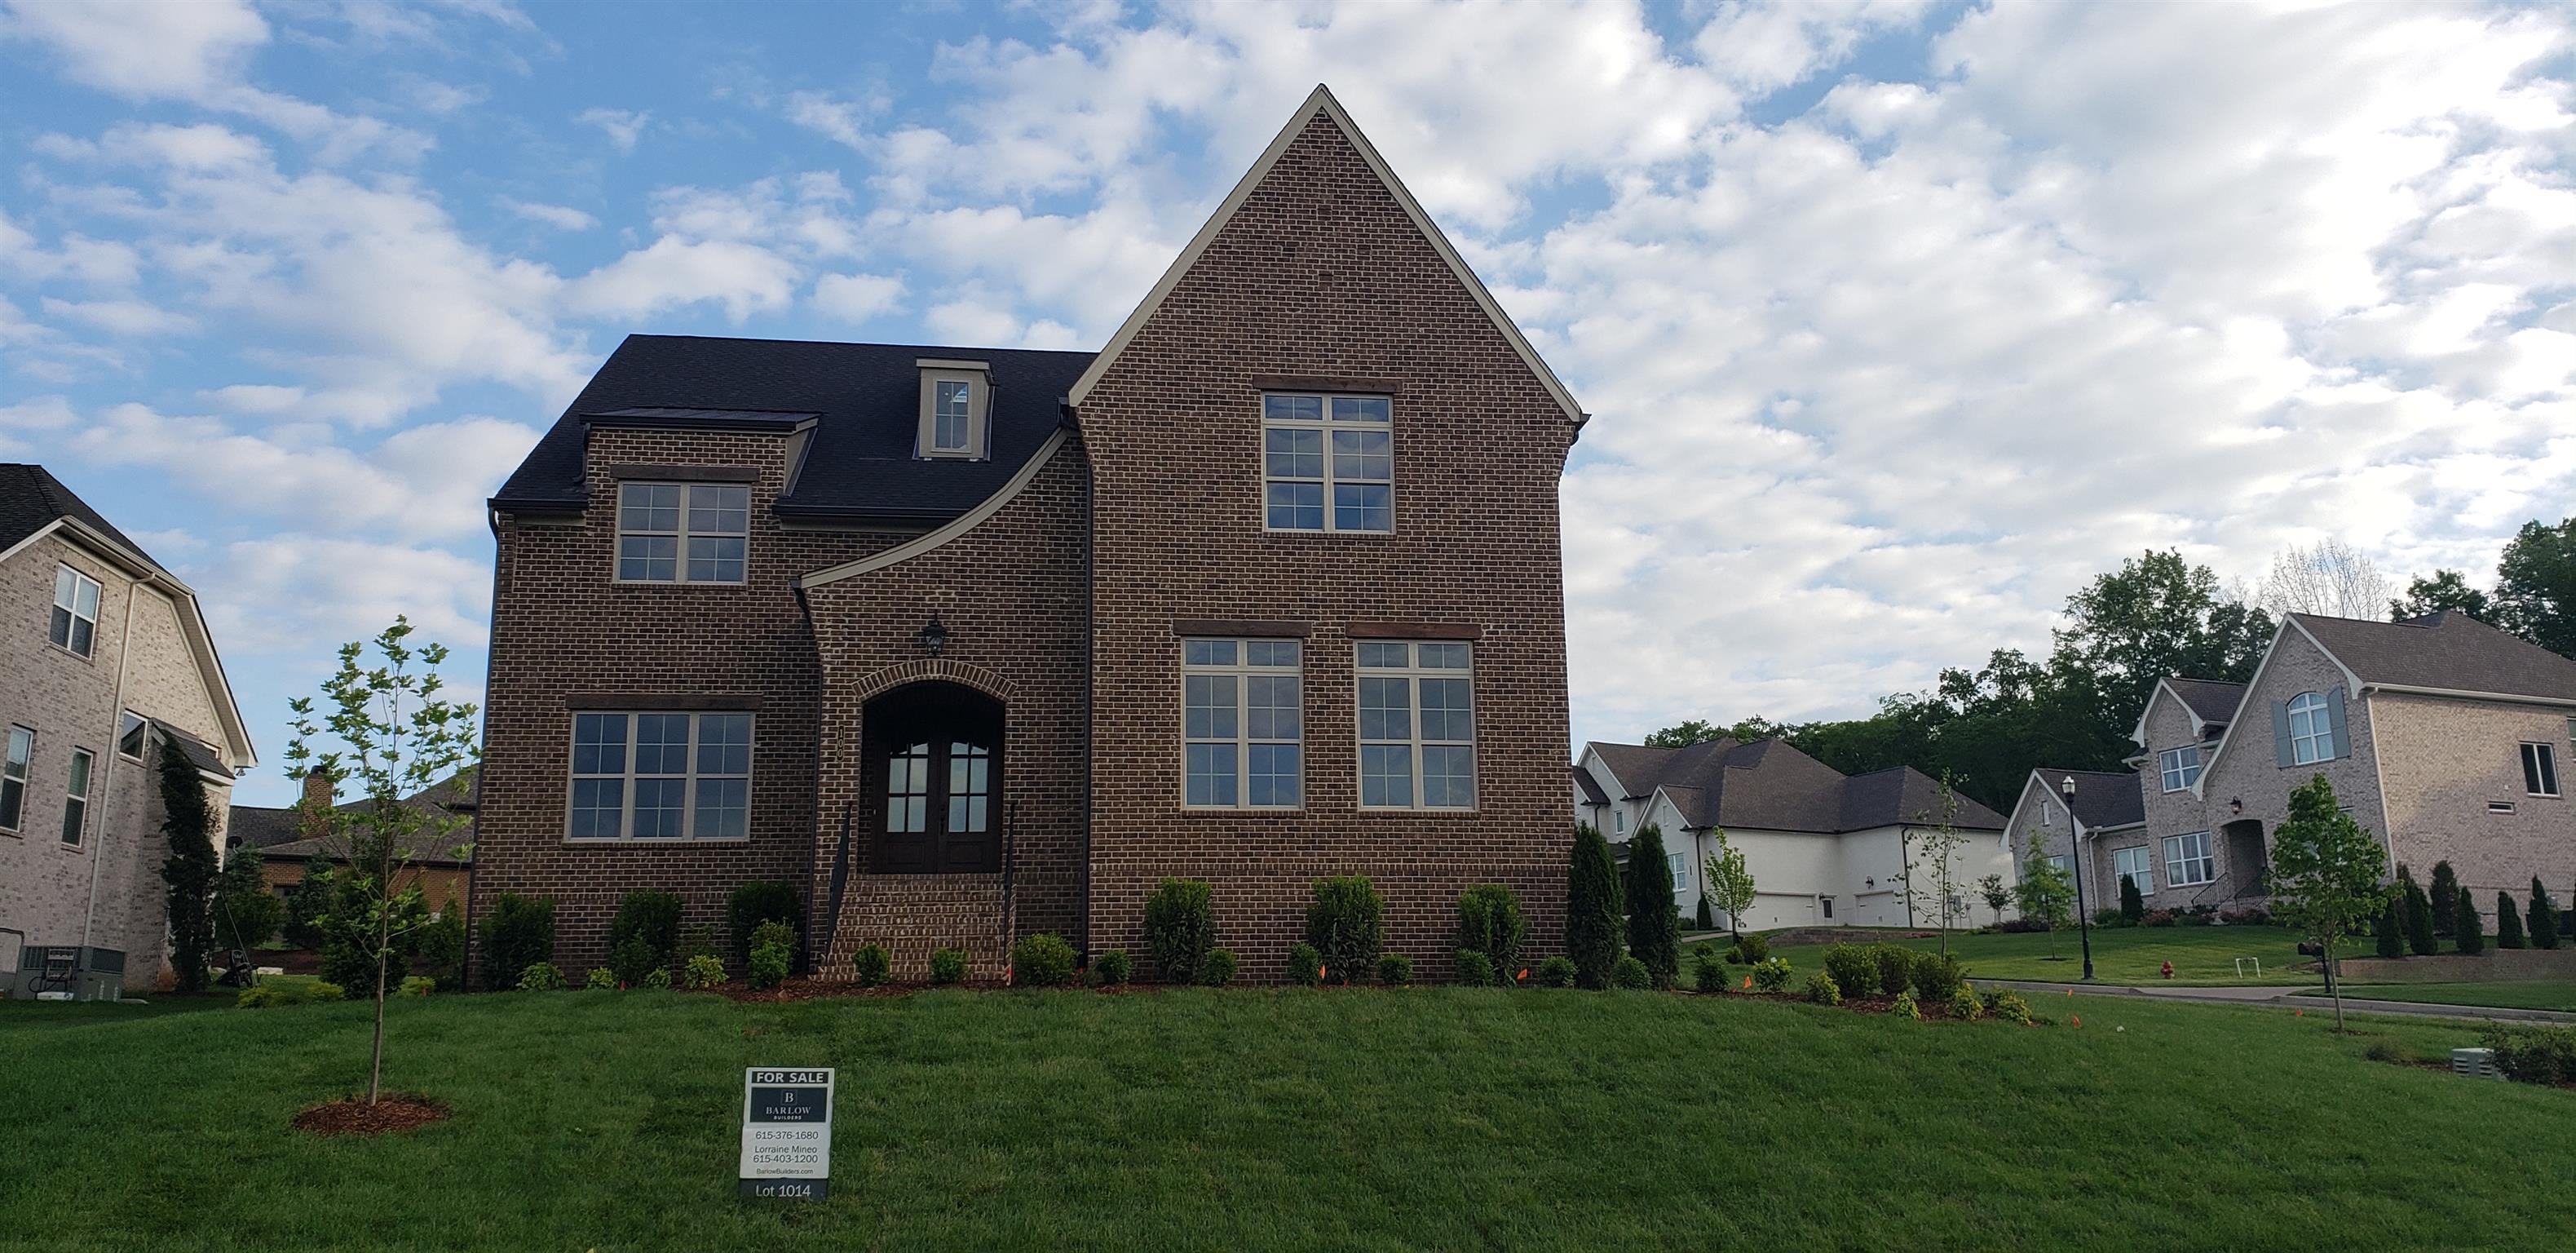 100 Watertown Dr Lot 1014, Nolensville, TN 37135 - Nolensville, TN real estate listing